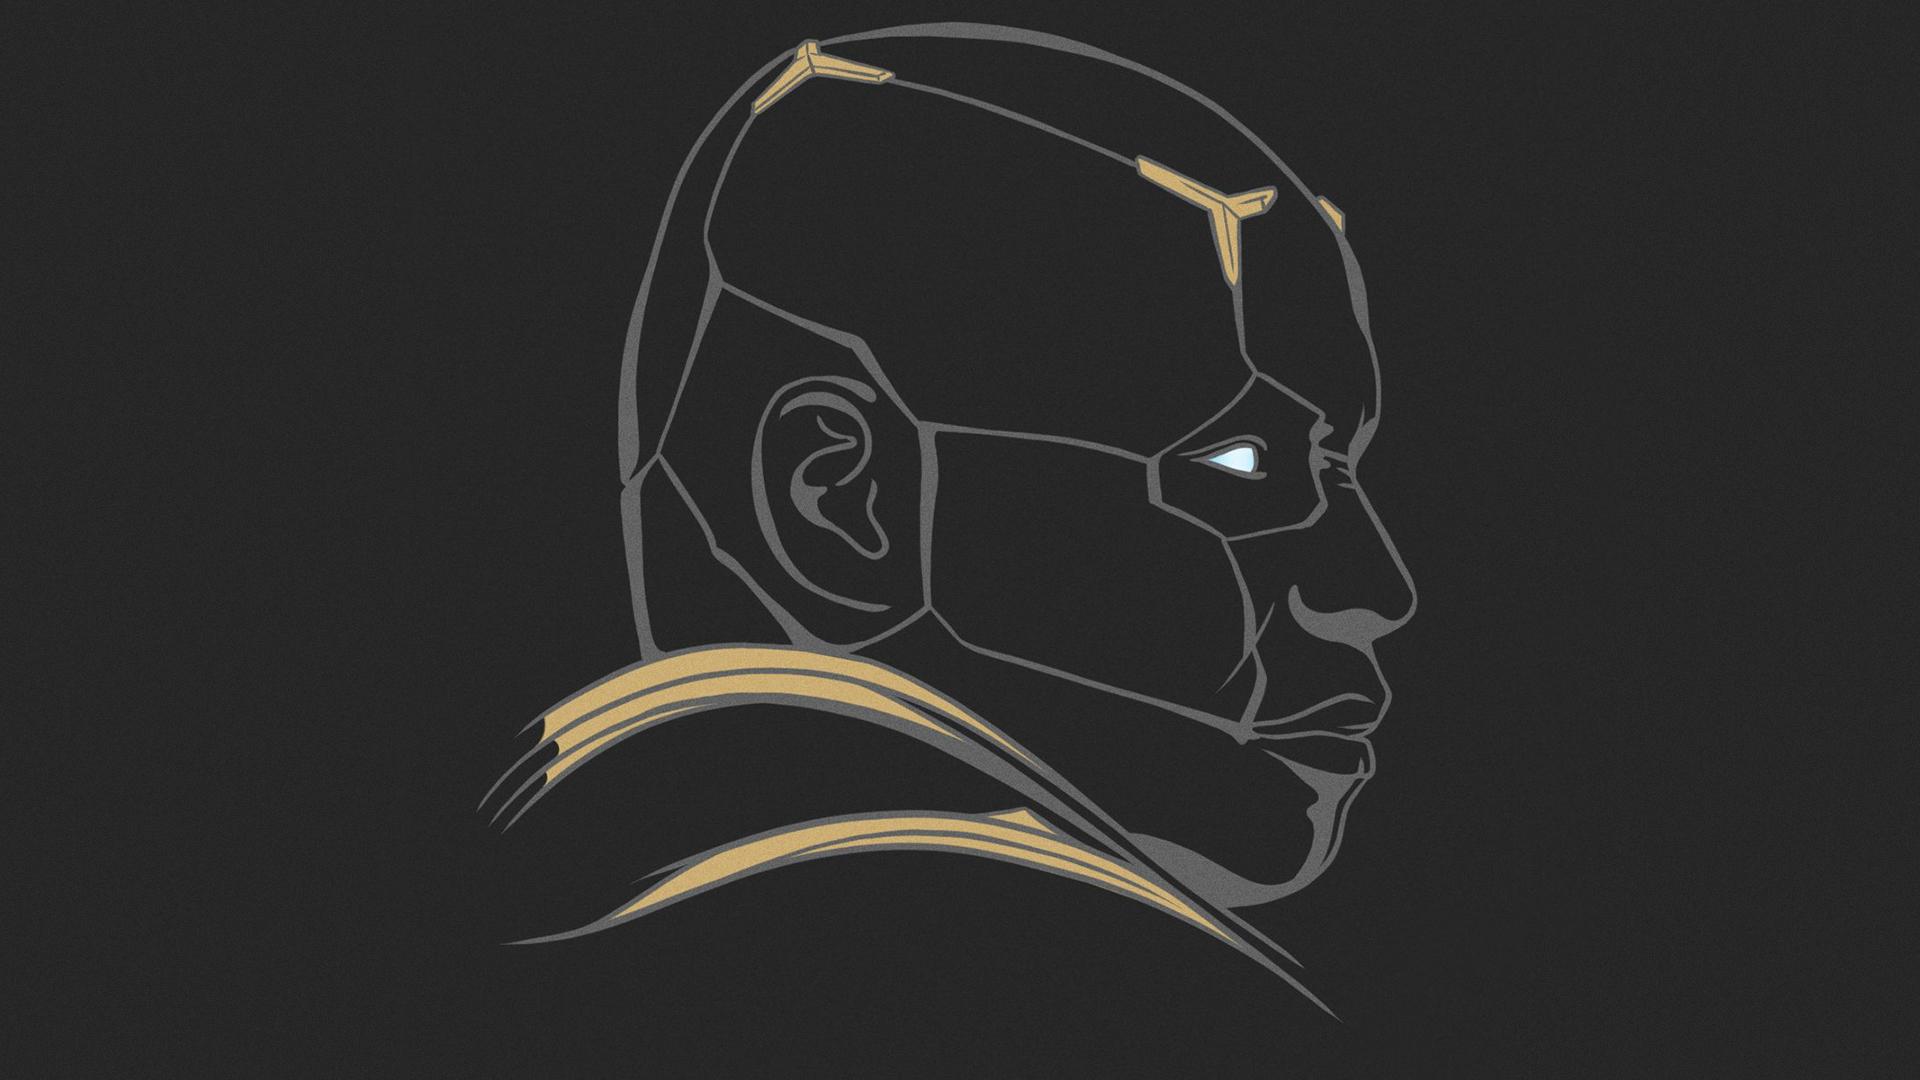 Mortal Kombat Background Geras 187 Mortal Kombat Games